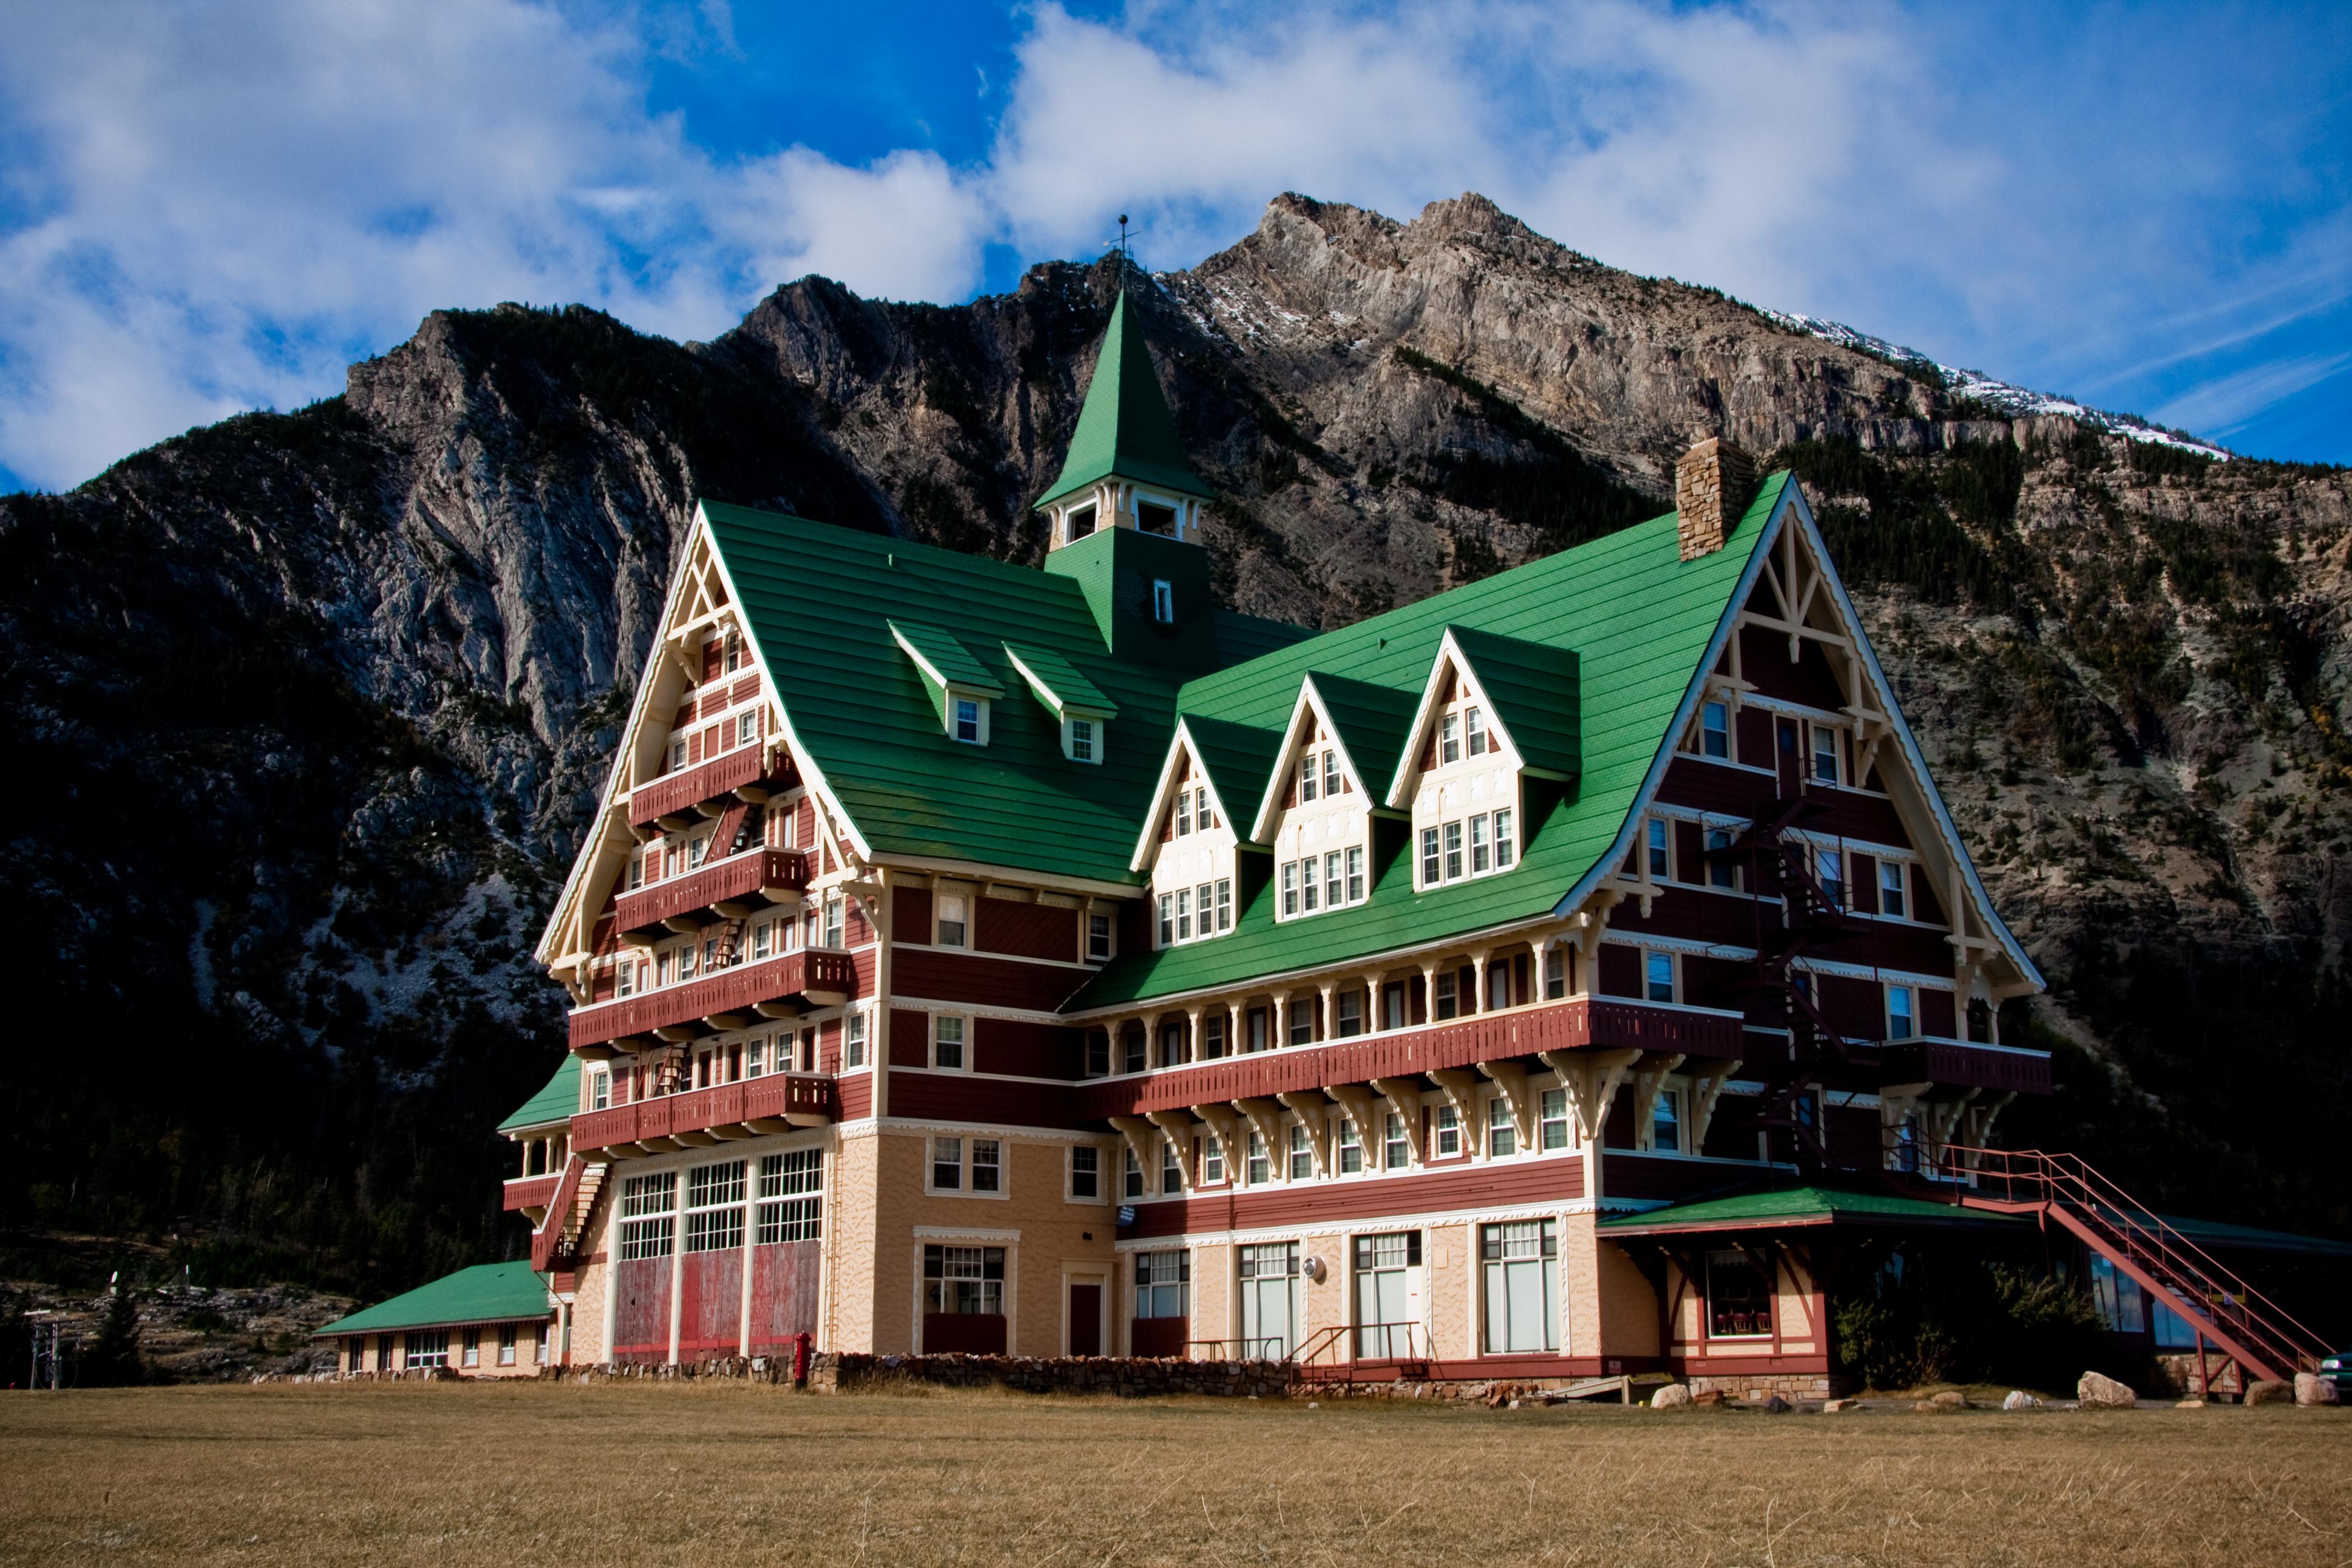 Grand Prince Hotel Akasaka Restaurant Fran Ef Bf Bdais